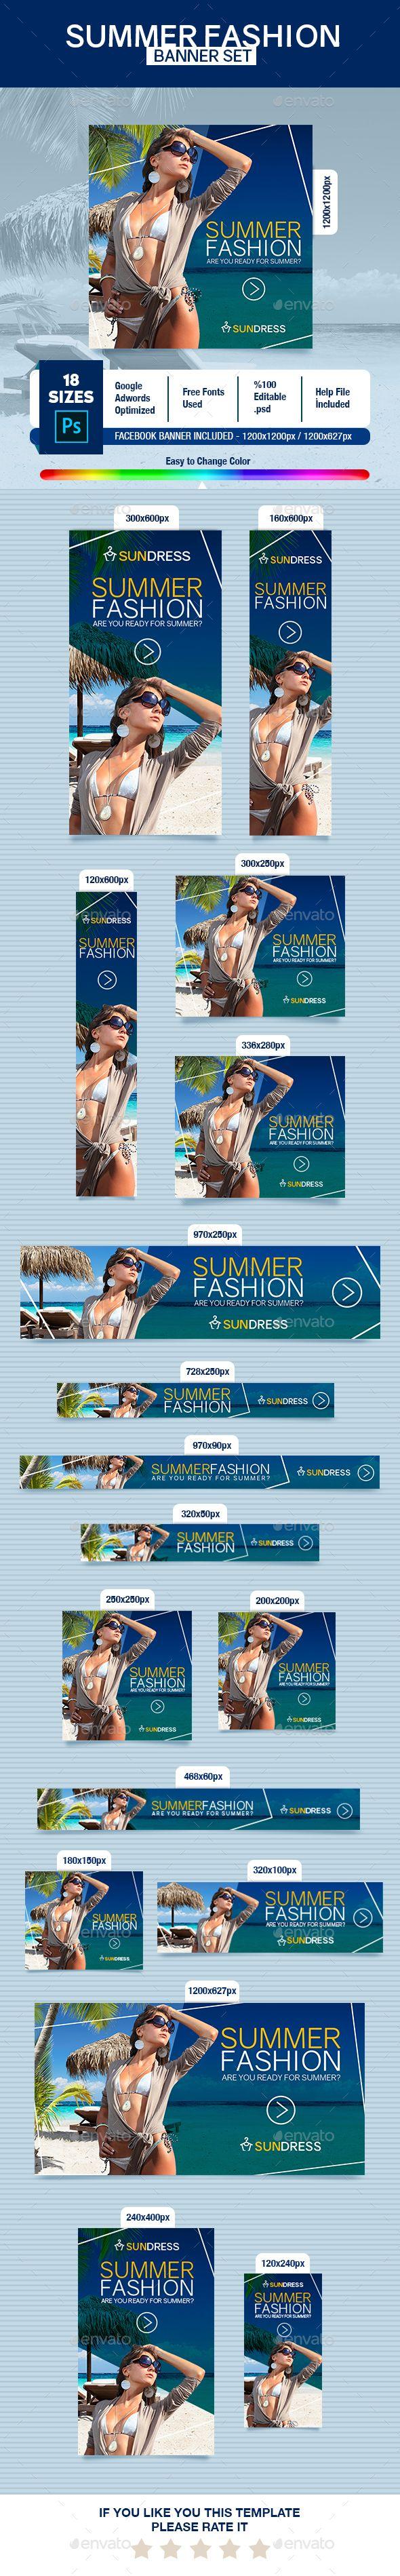 #Summer Fashion Banner Set - #Banners & Ads #Web Elements